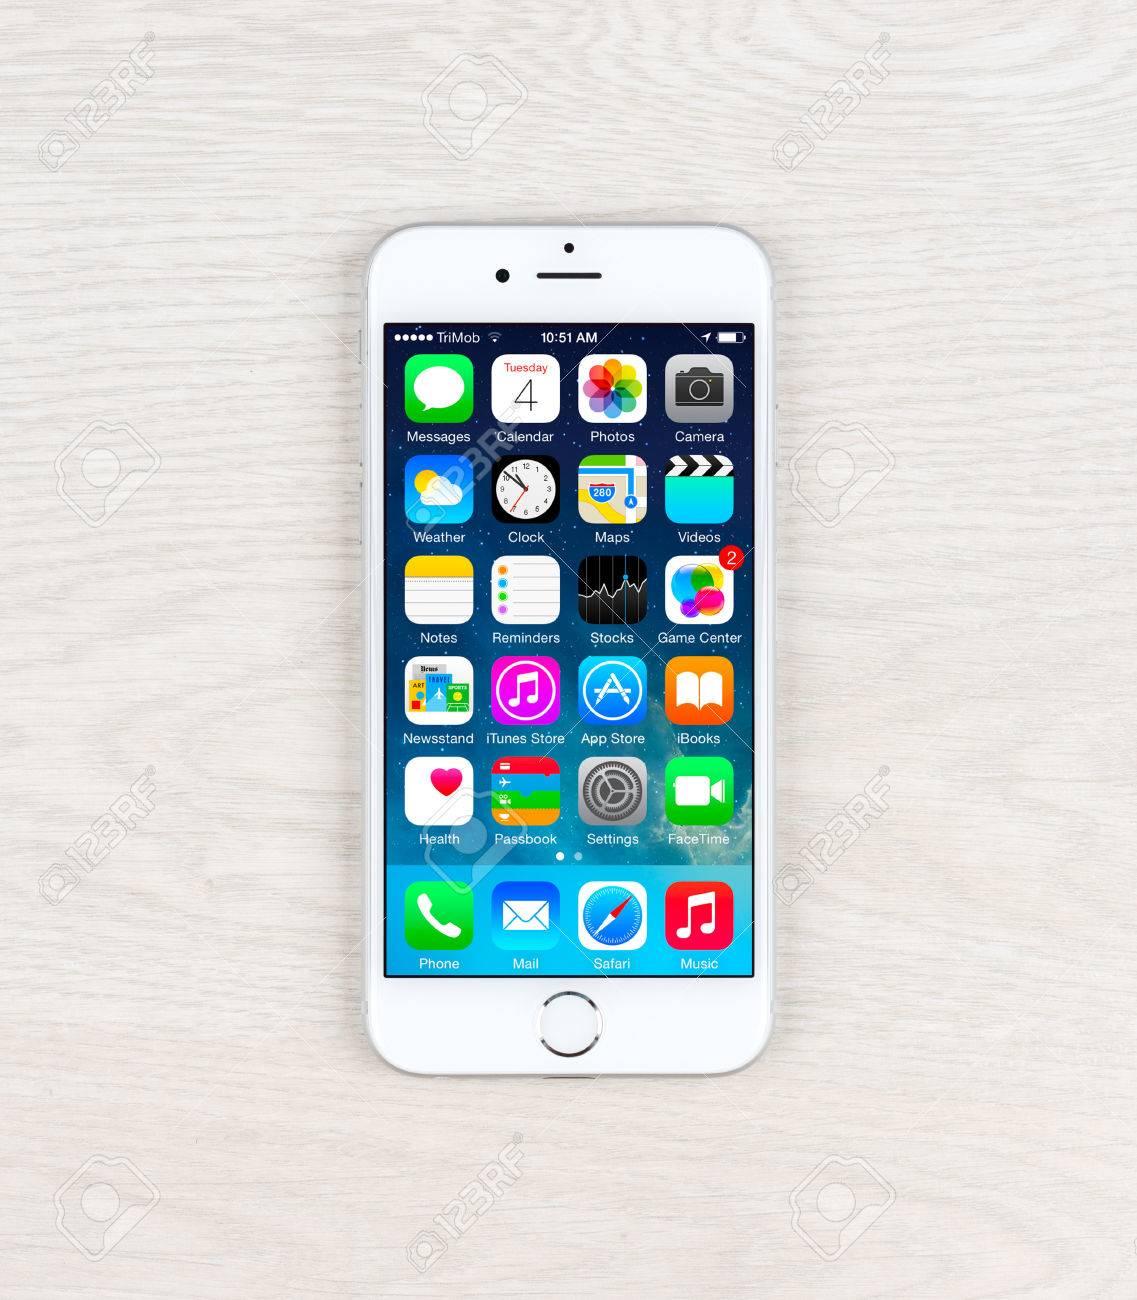 Simferopol Russia November 03 2014 Apple Iphone 6 Over Table